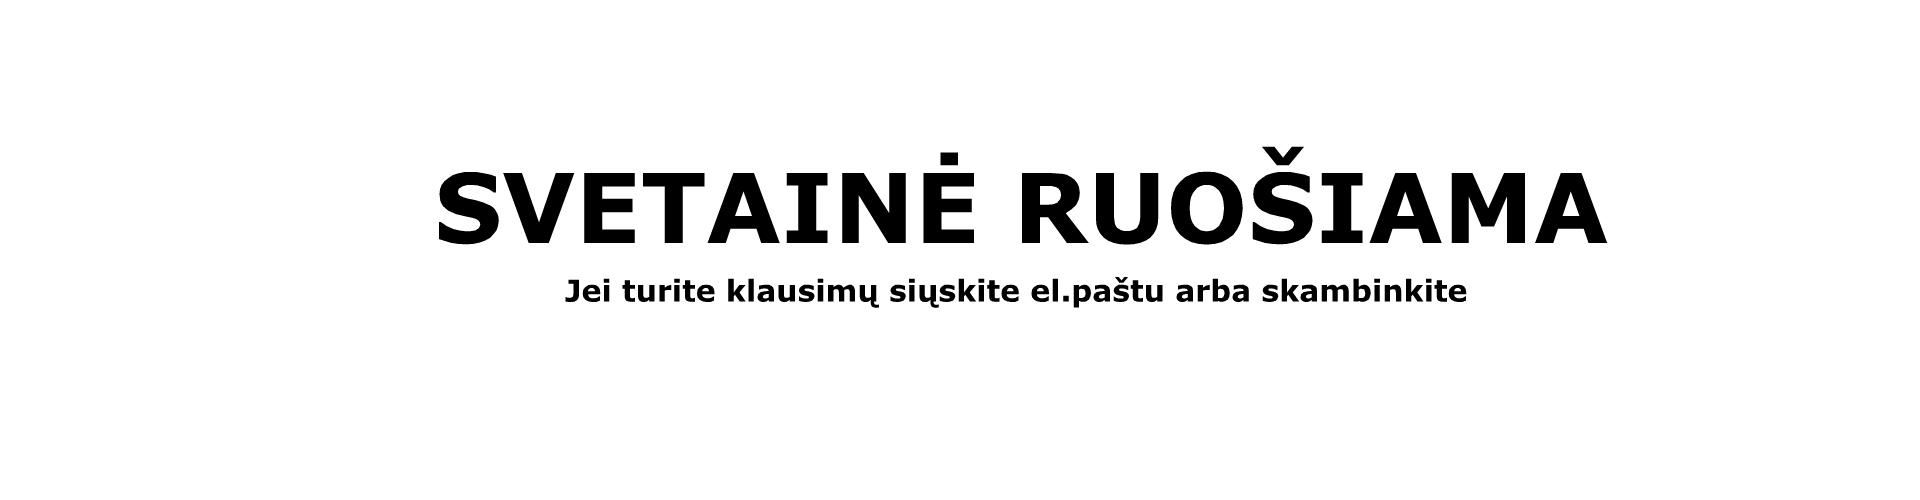 catalog/svetaine-ruosiama.png